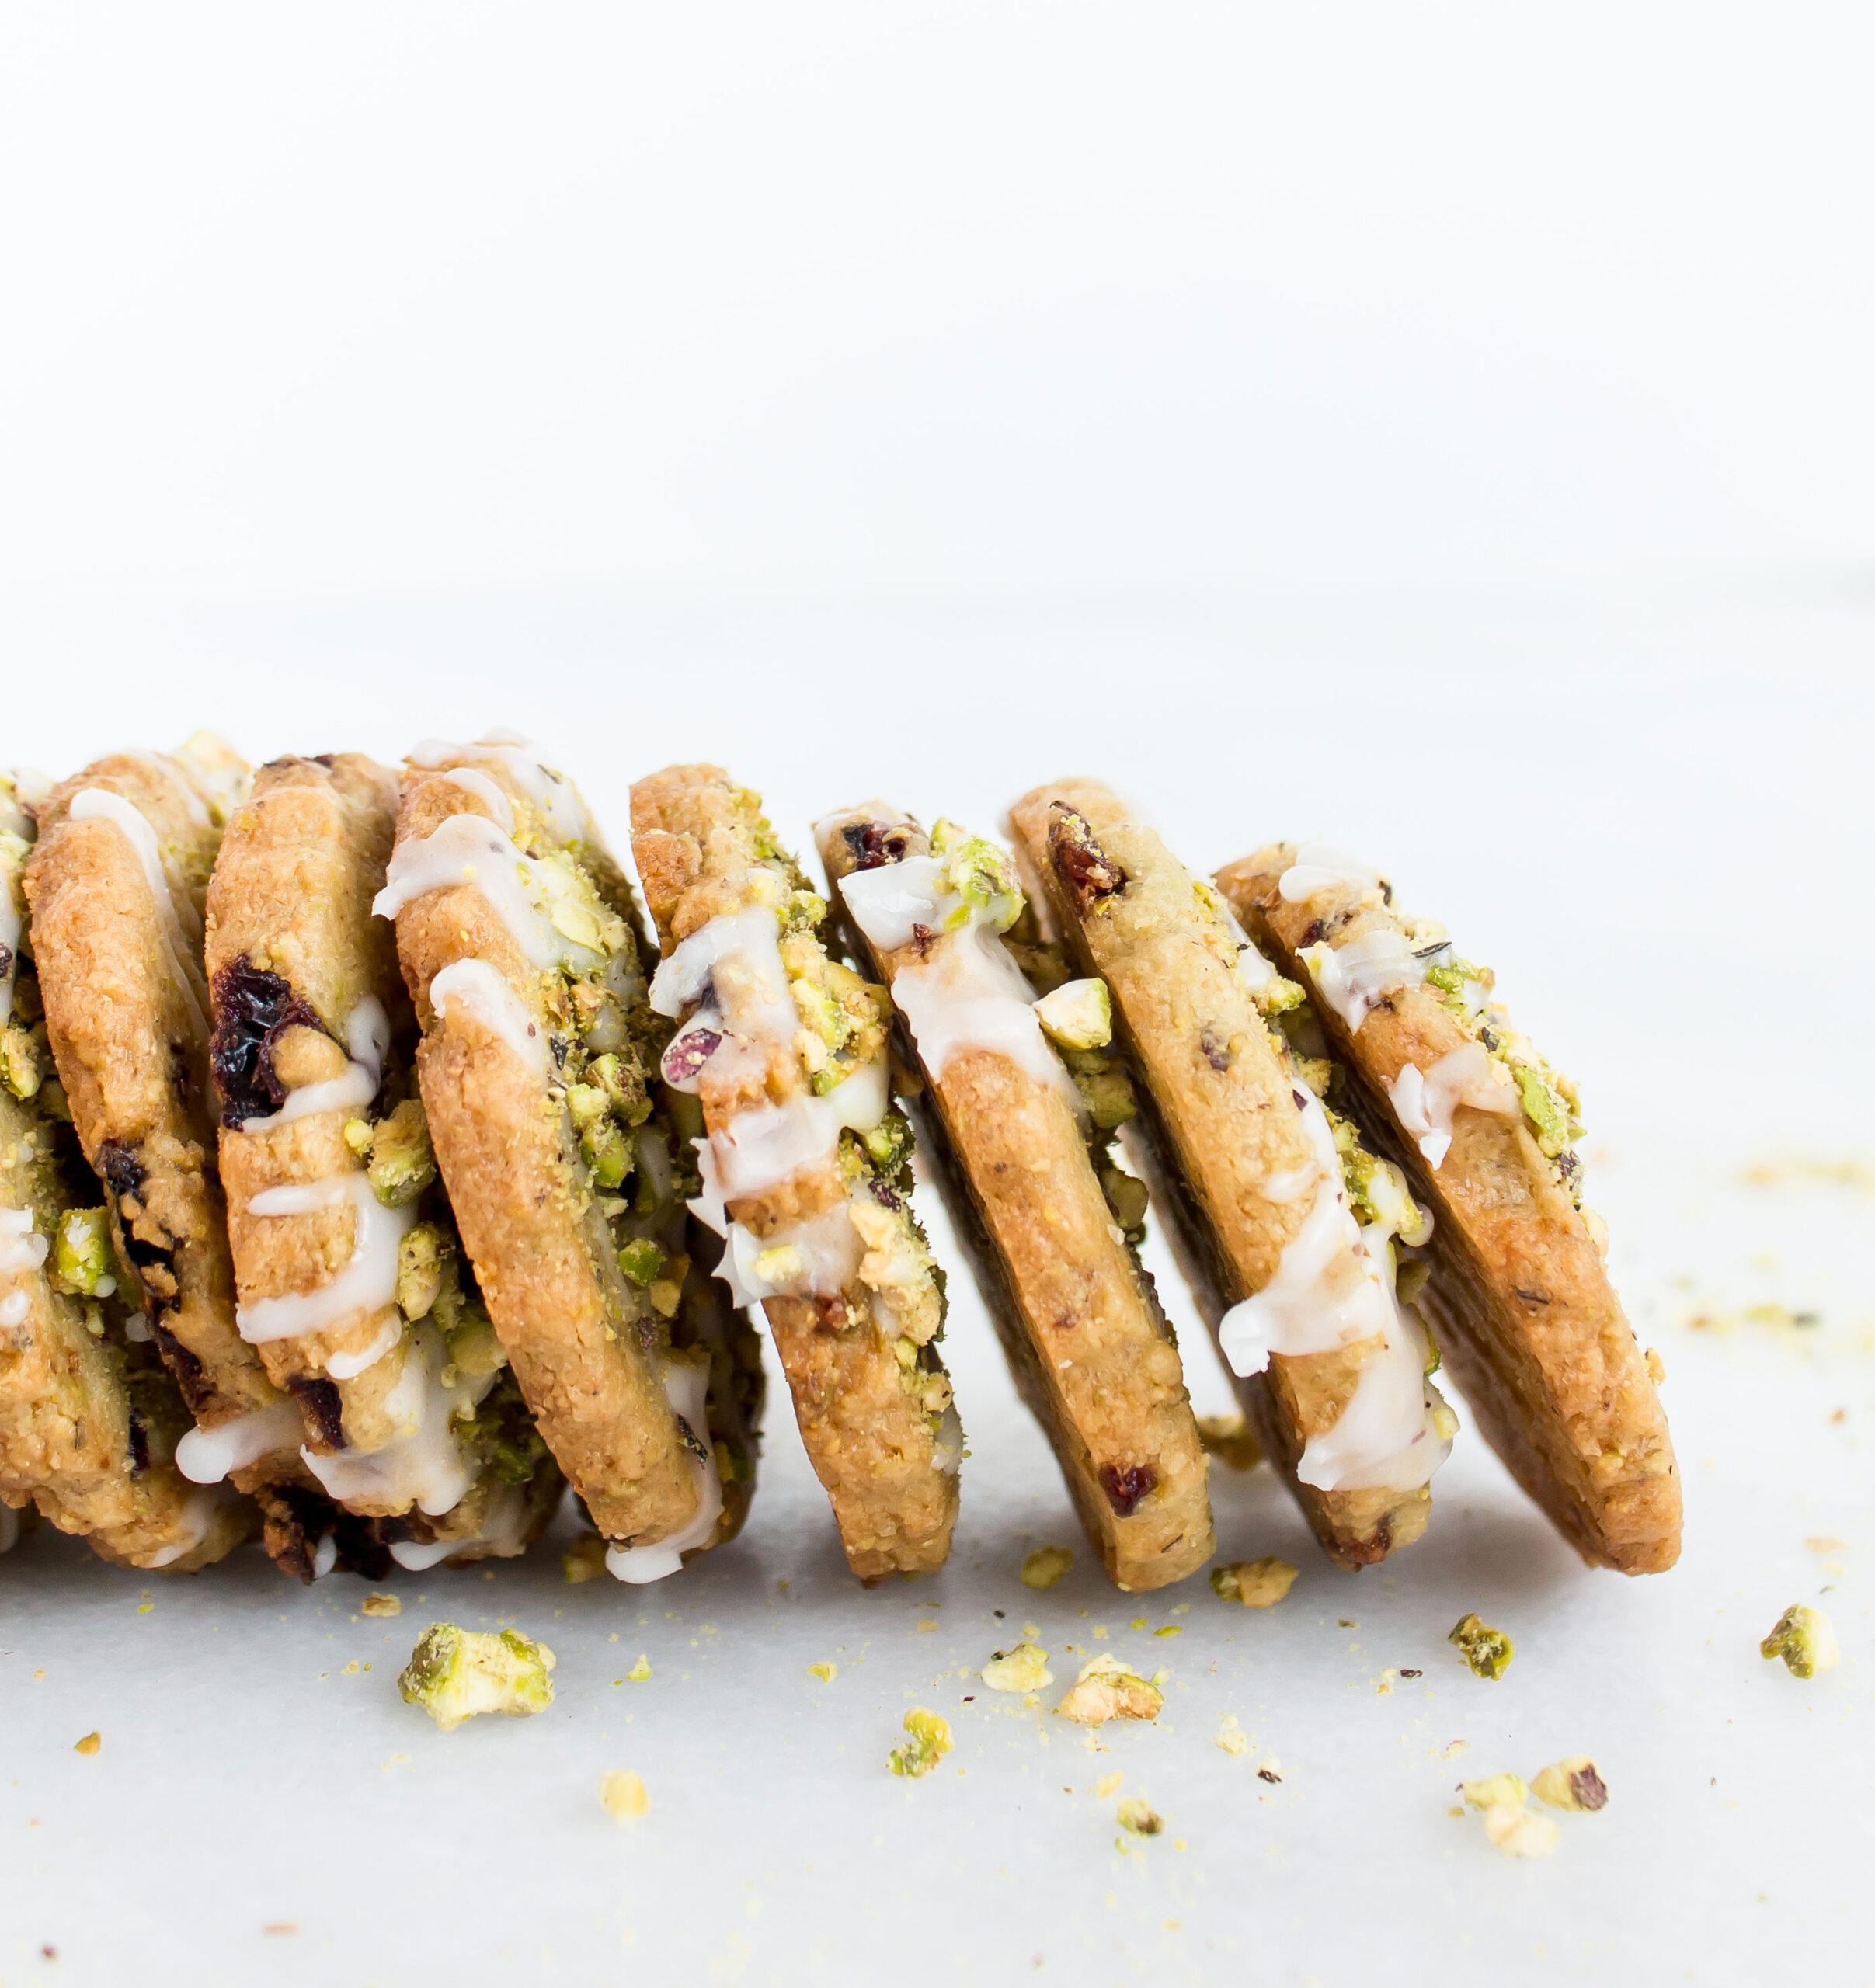 Frosted Pistachio Cranberry Shortbread Cookies | glitterinc.com | @glitterinc